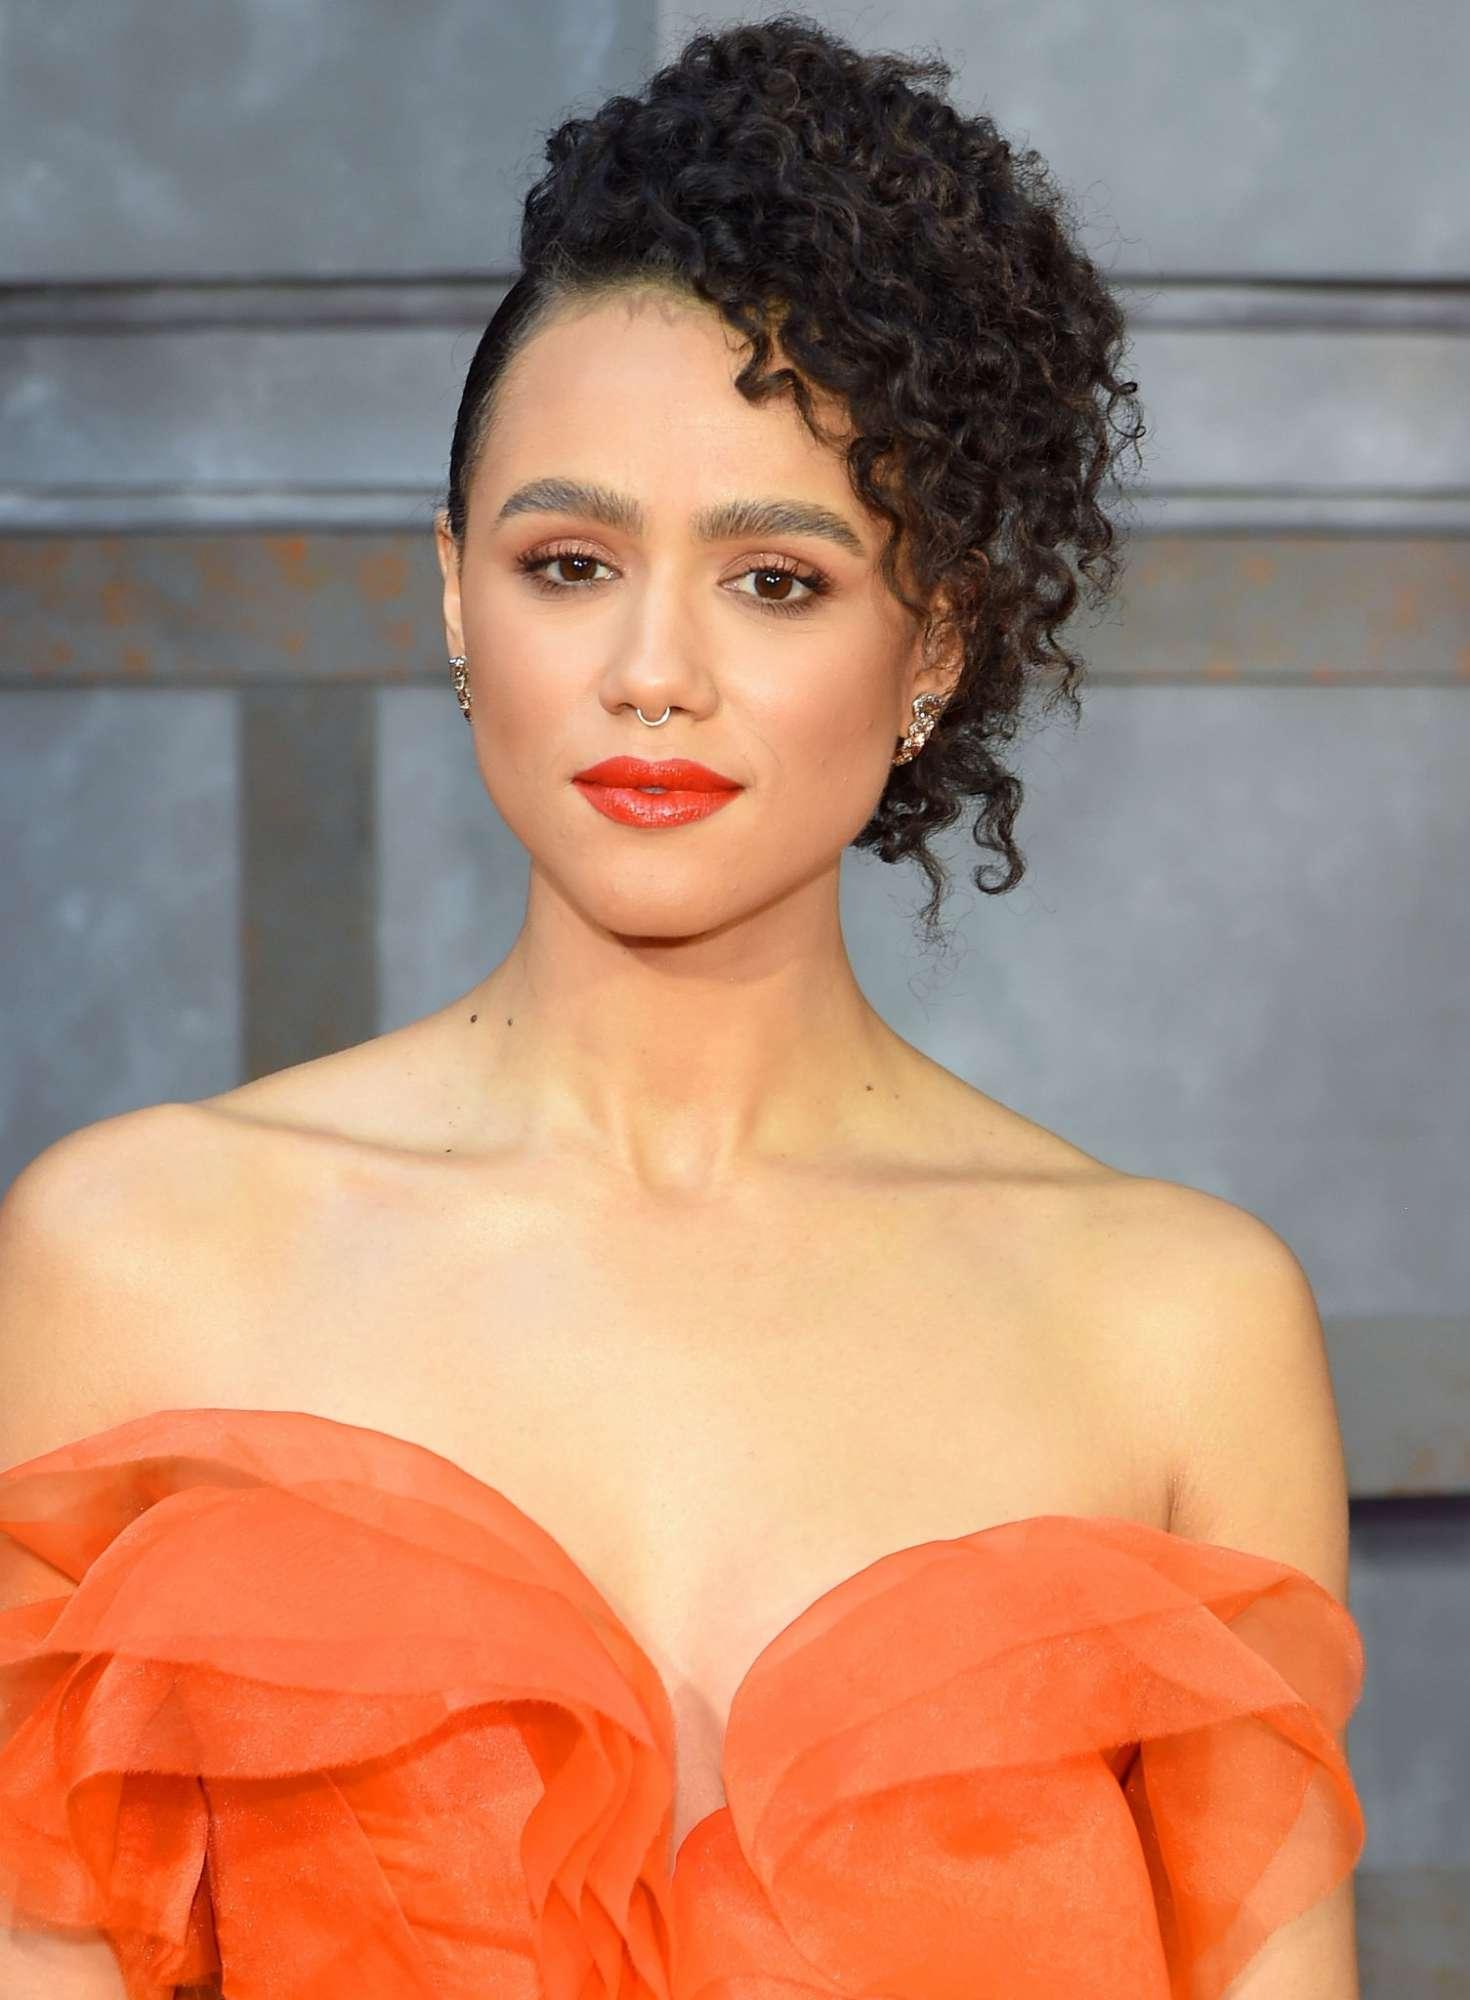 Nathalie Emmanuel 2019 : Nathalie Emmanuel: Game of Thrones Season 8 Premiere -07